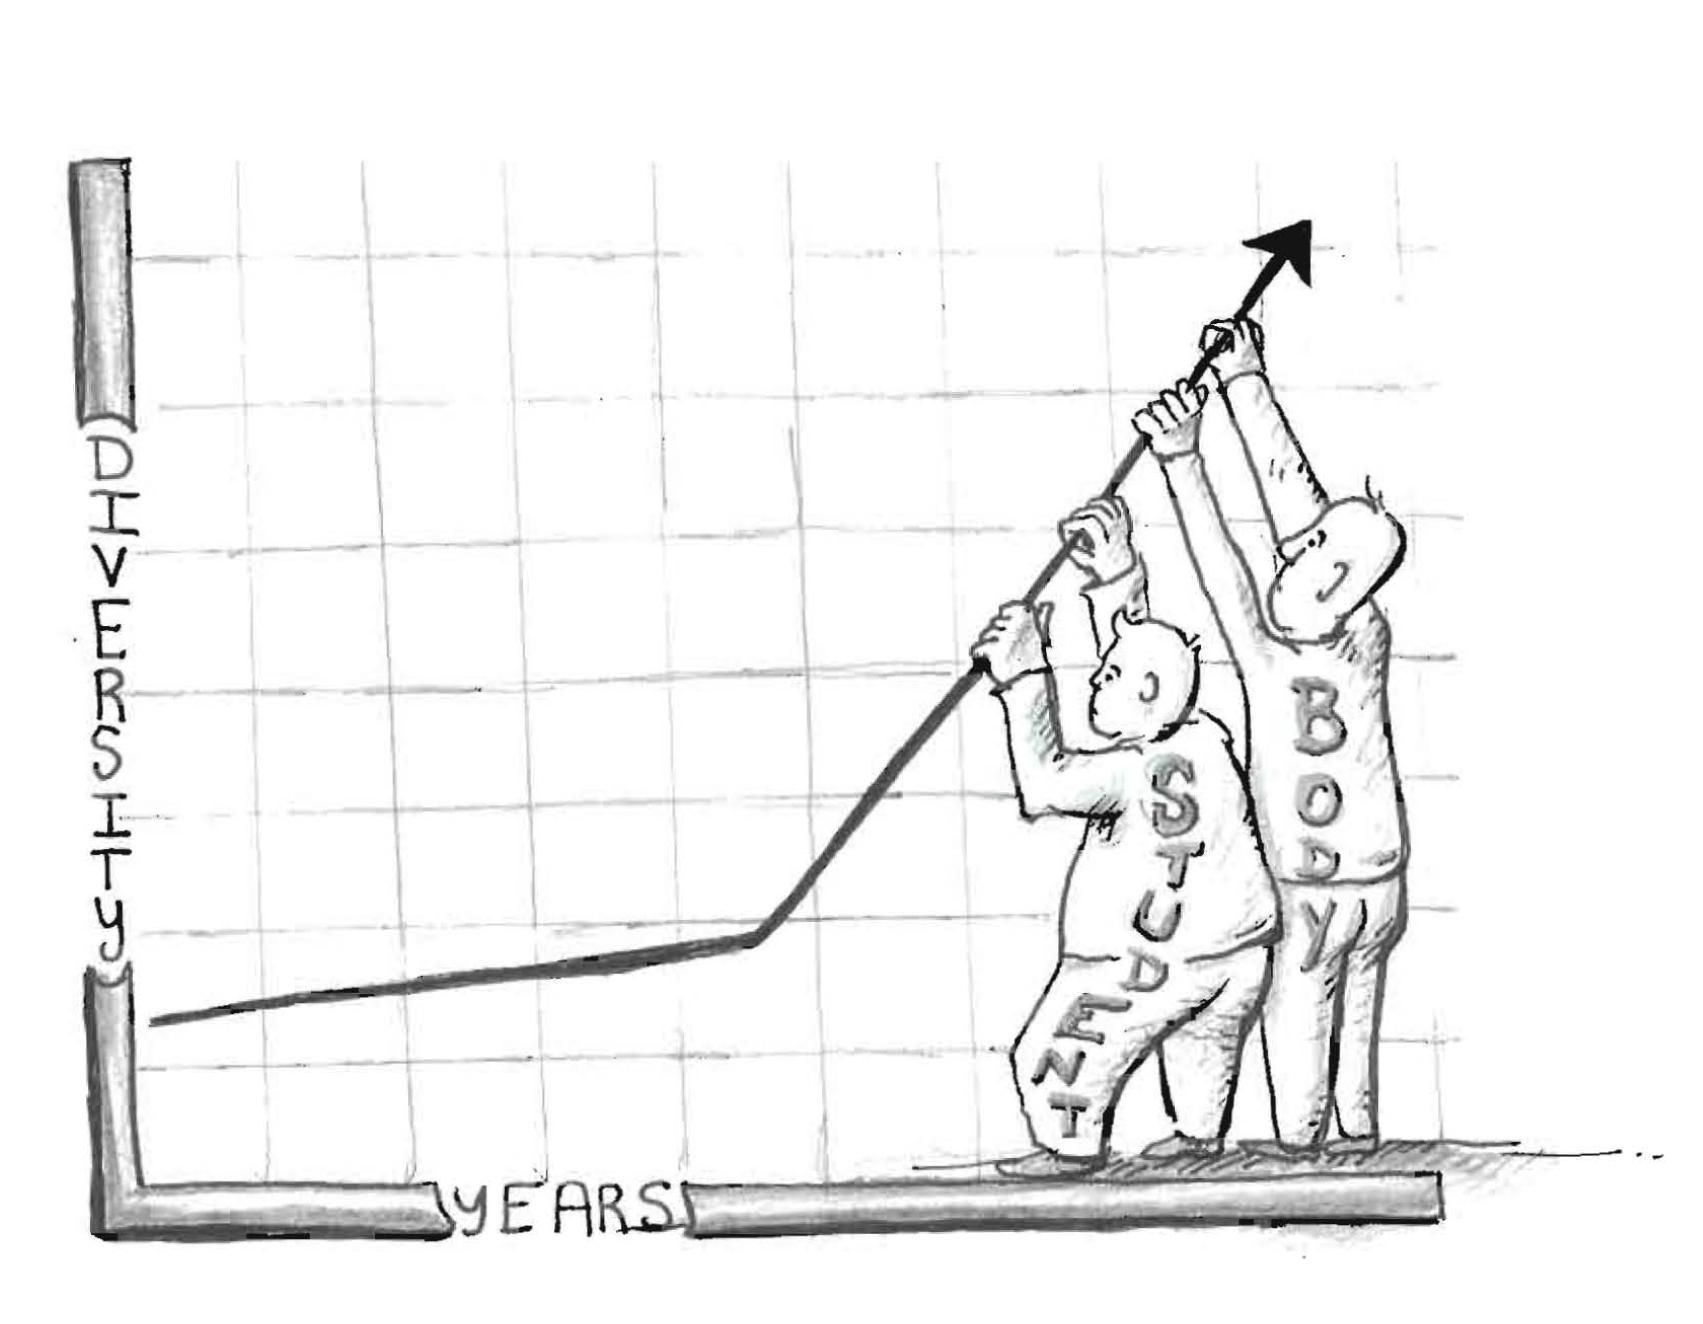 Charting Change